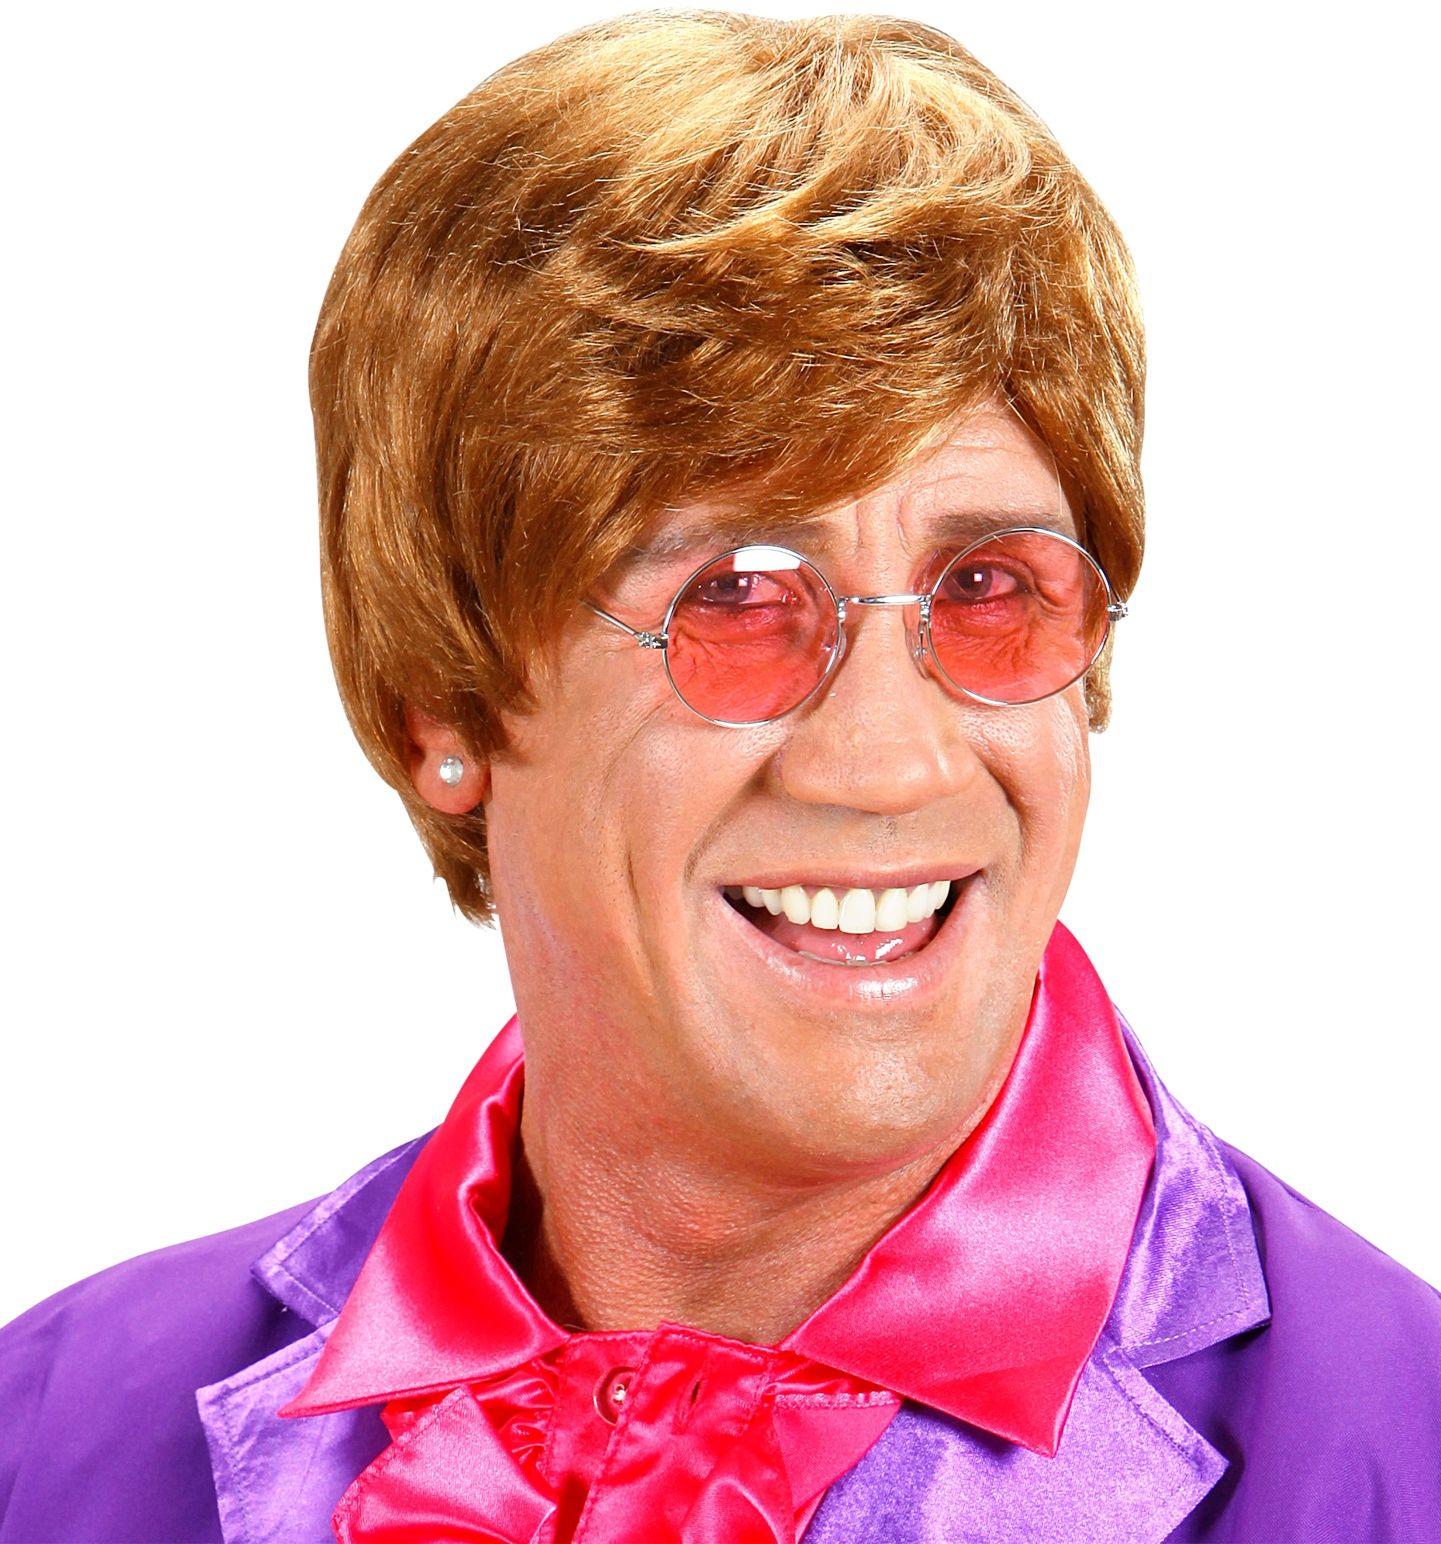 Bruine Elton John pruik